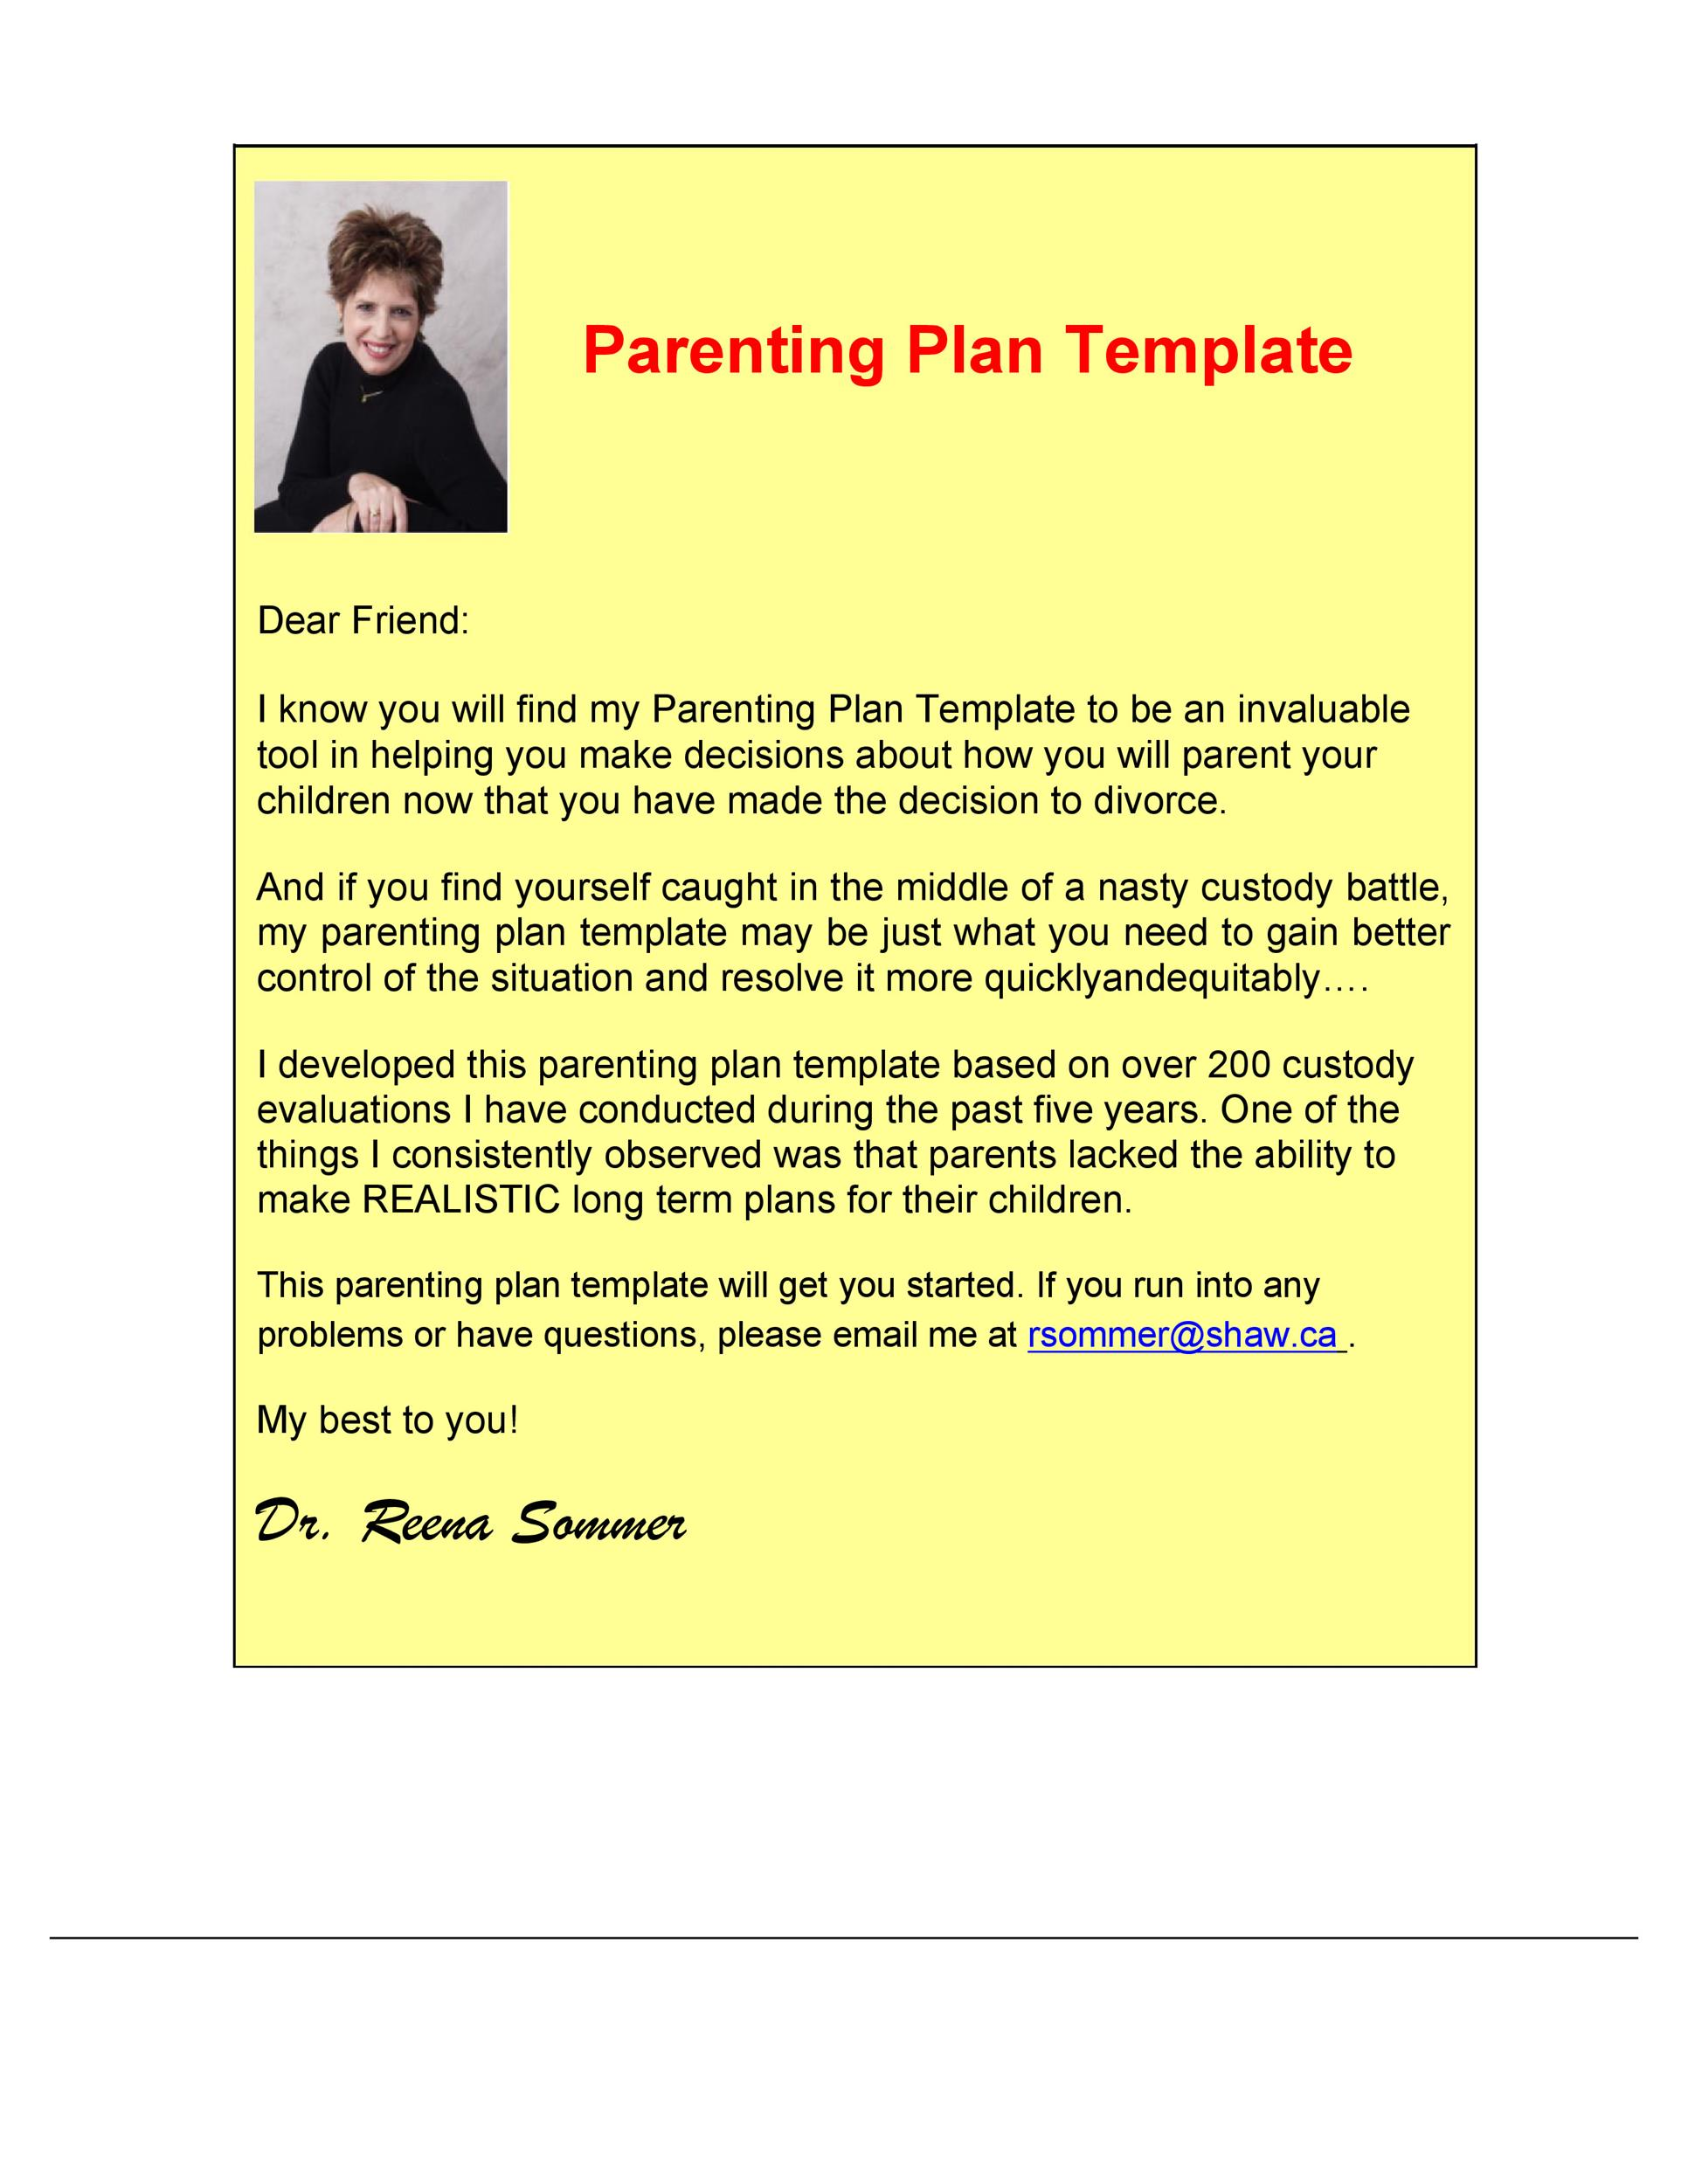 Free parenting plan template 06